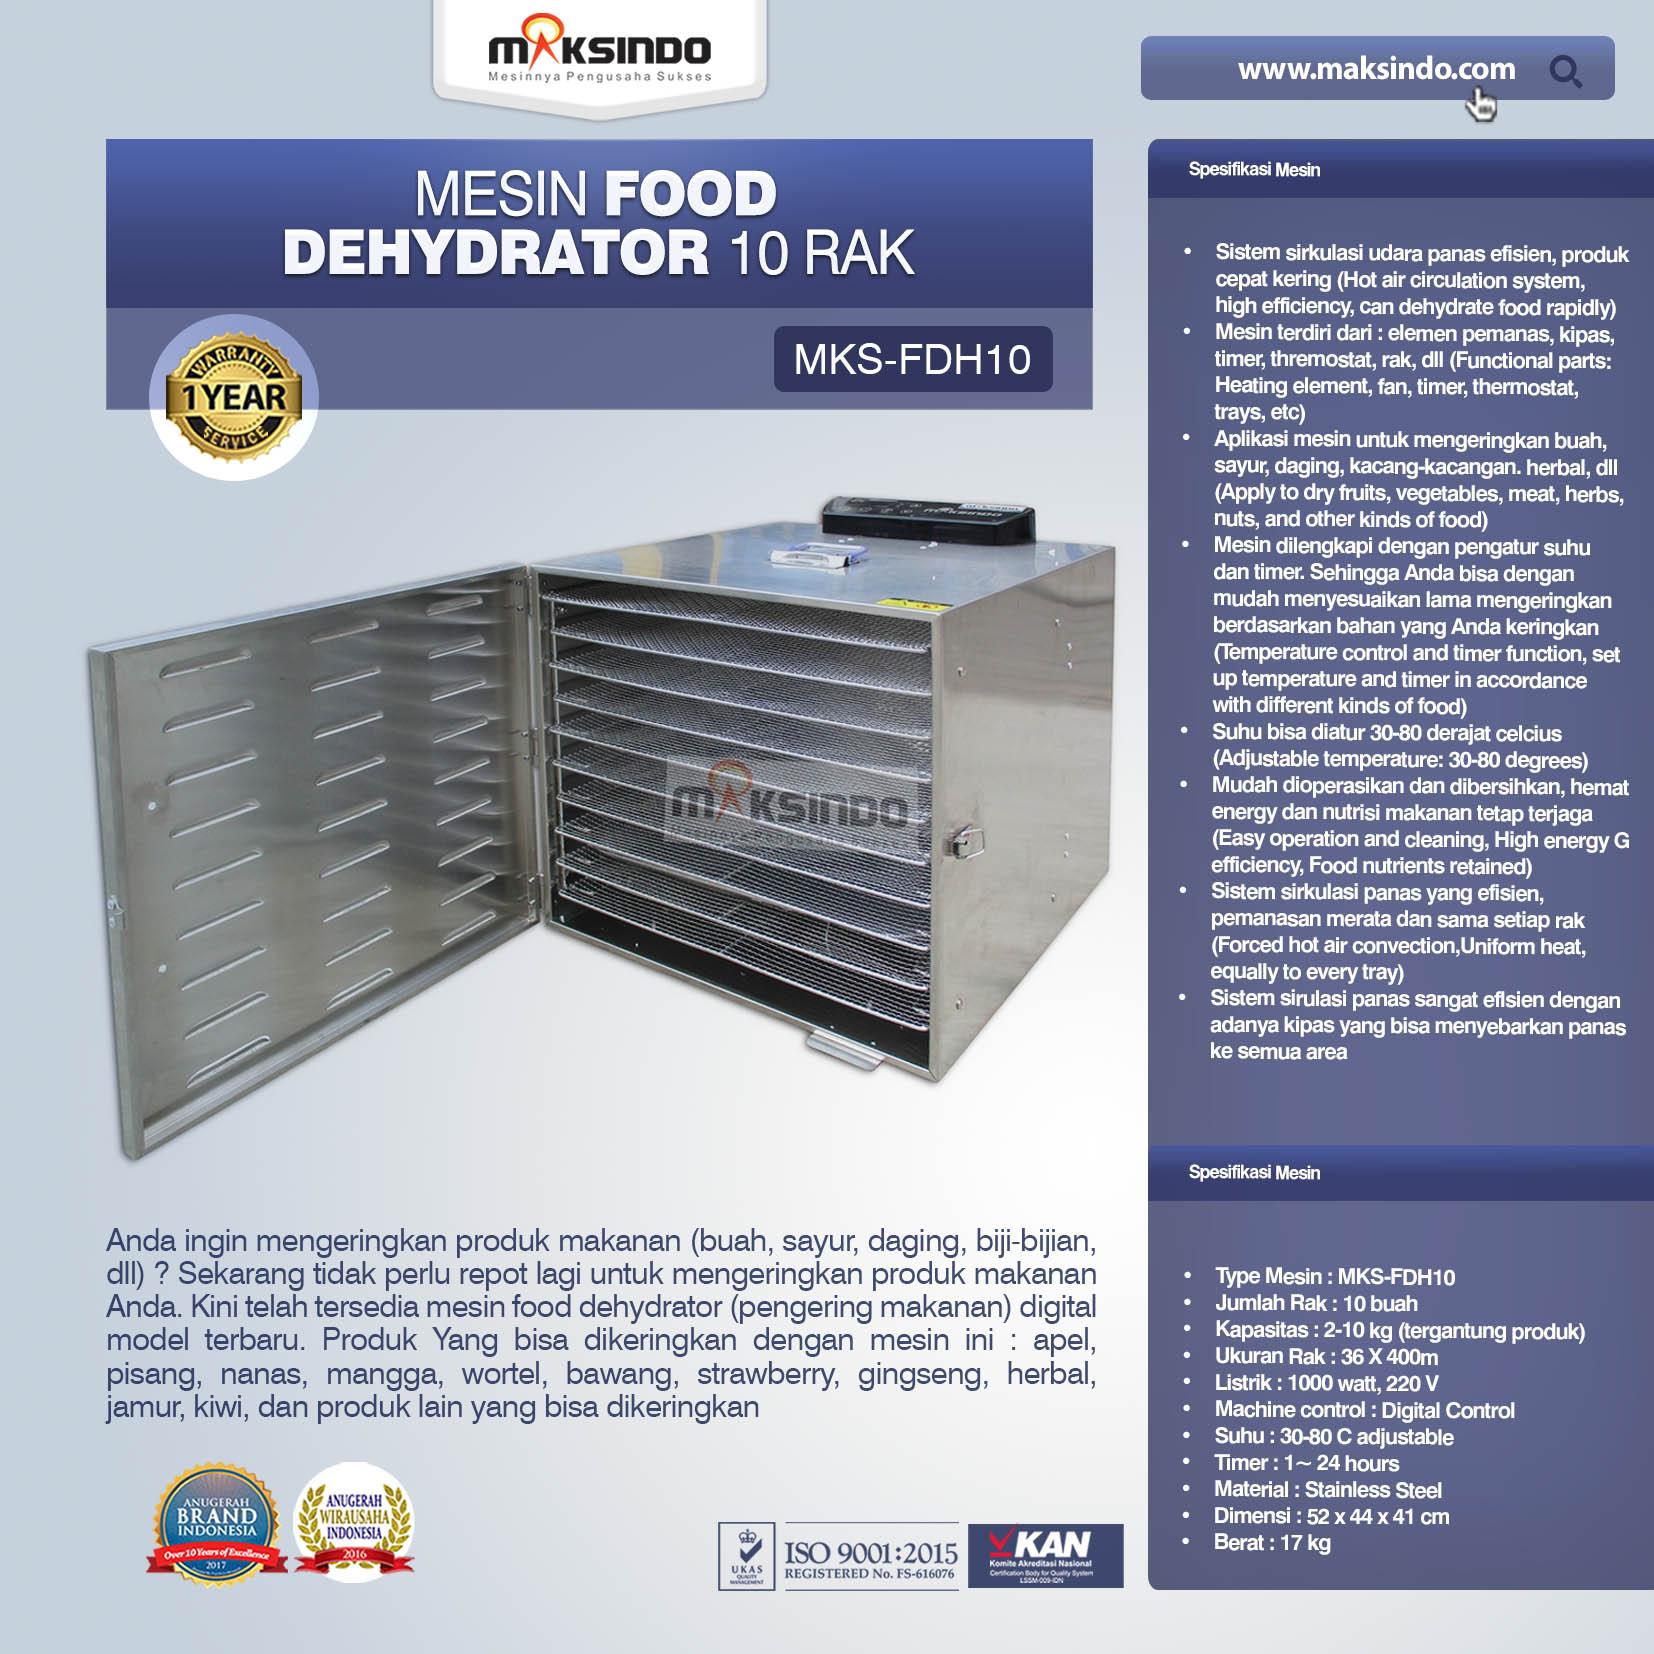 Jual Mesin Food Dehydrator 10 Rak (FDH10) di Makassar